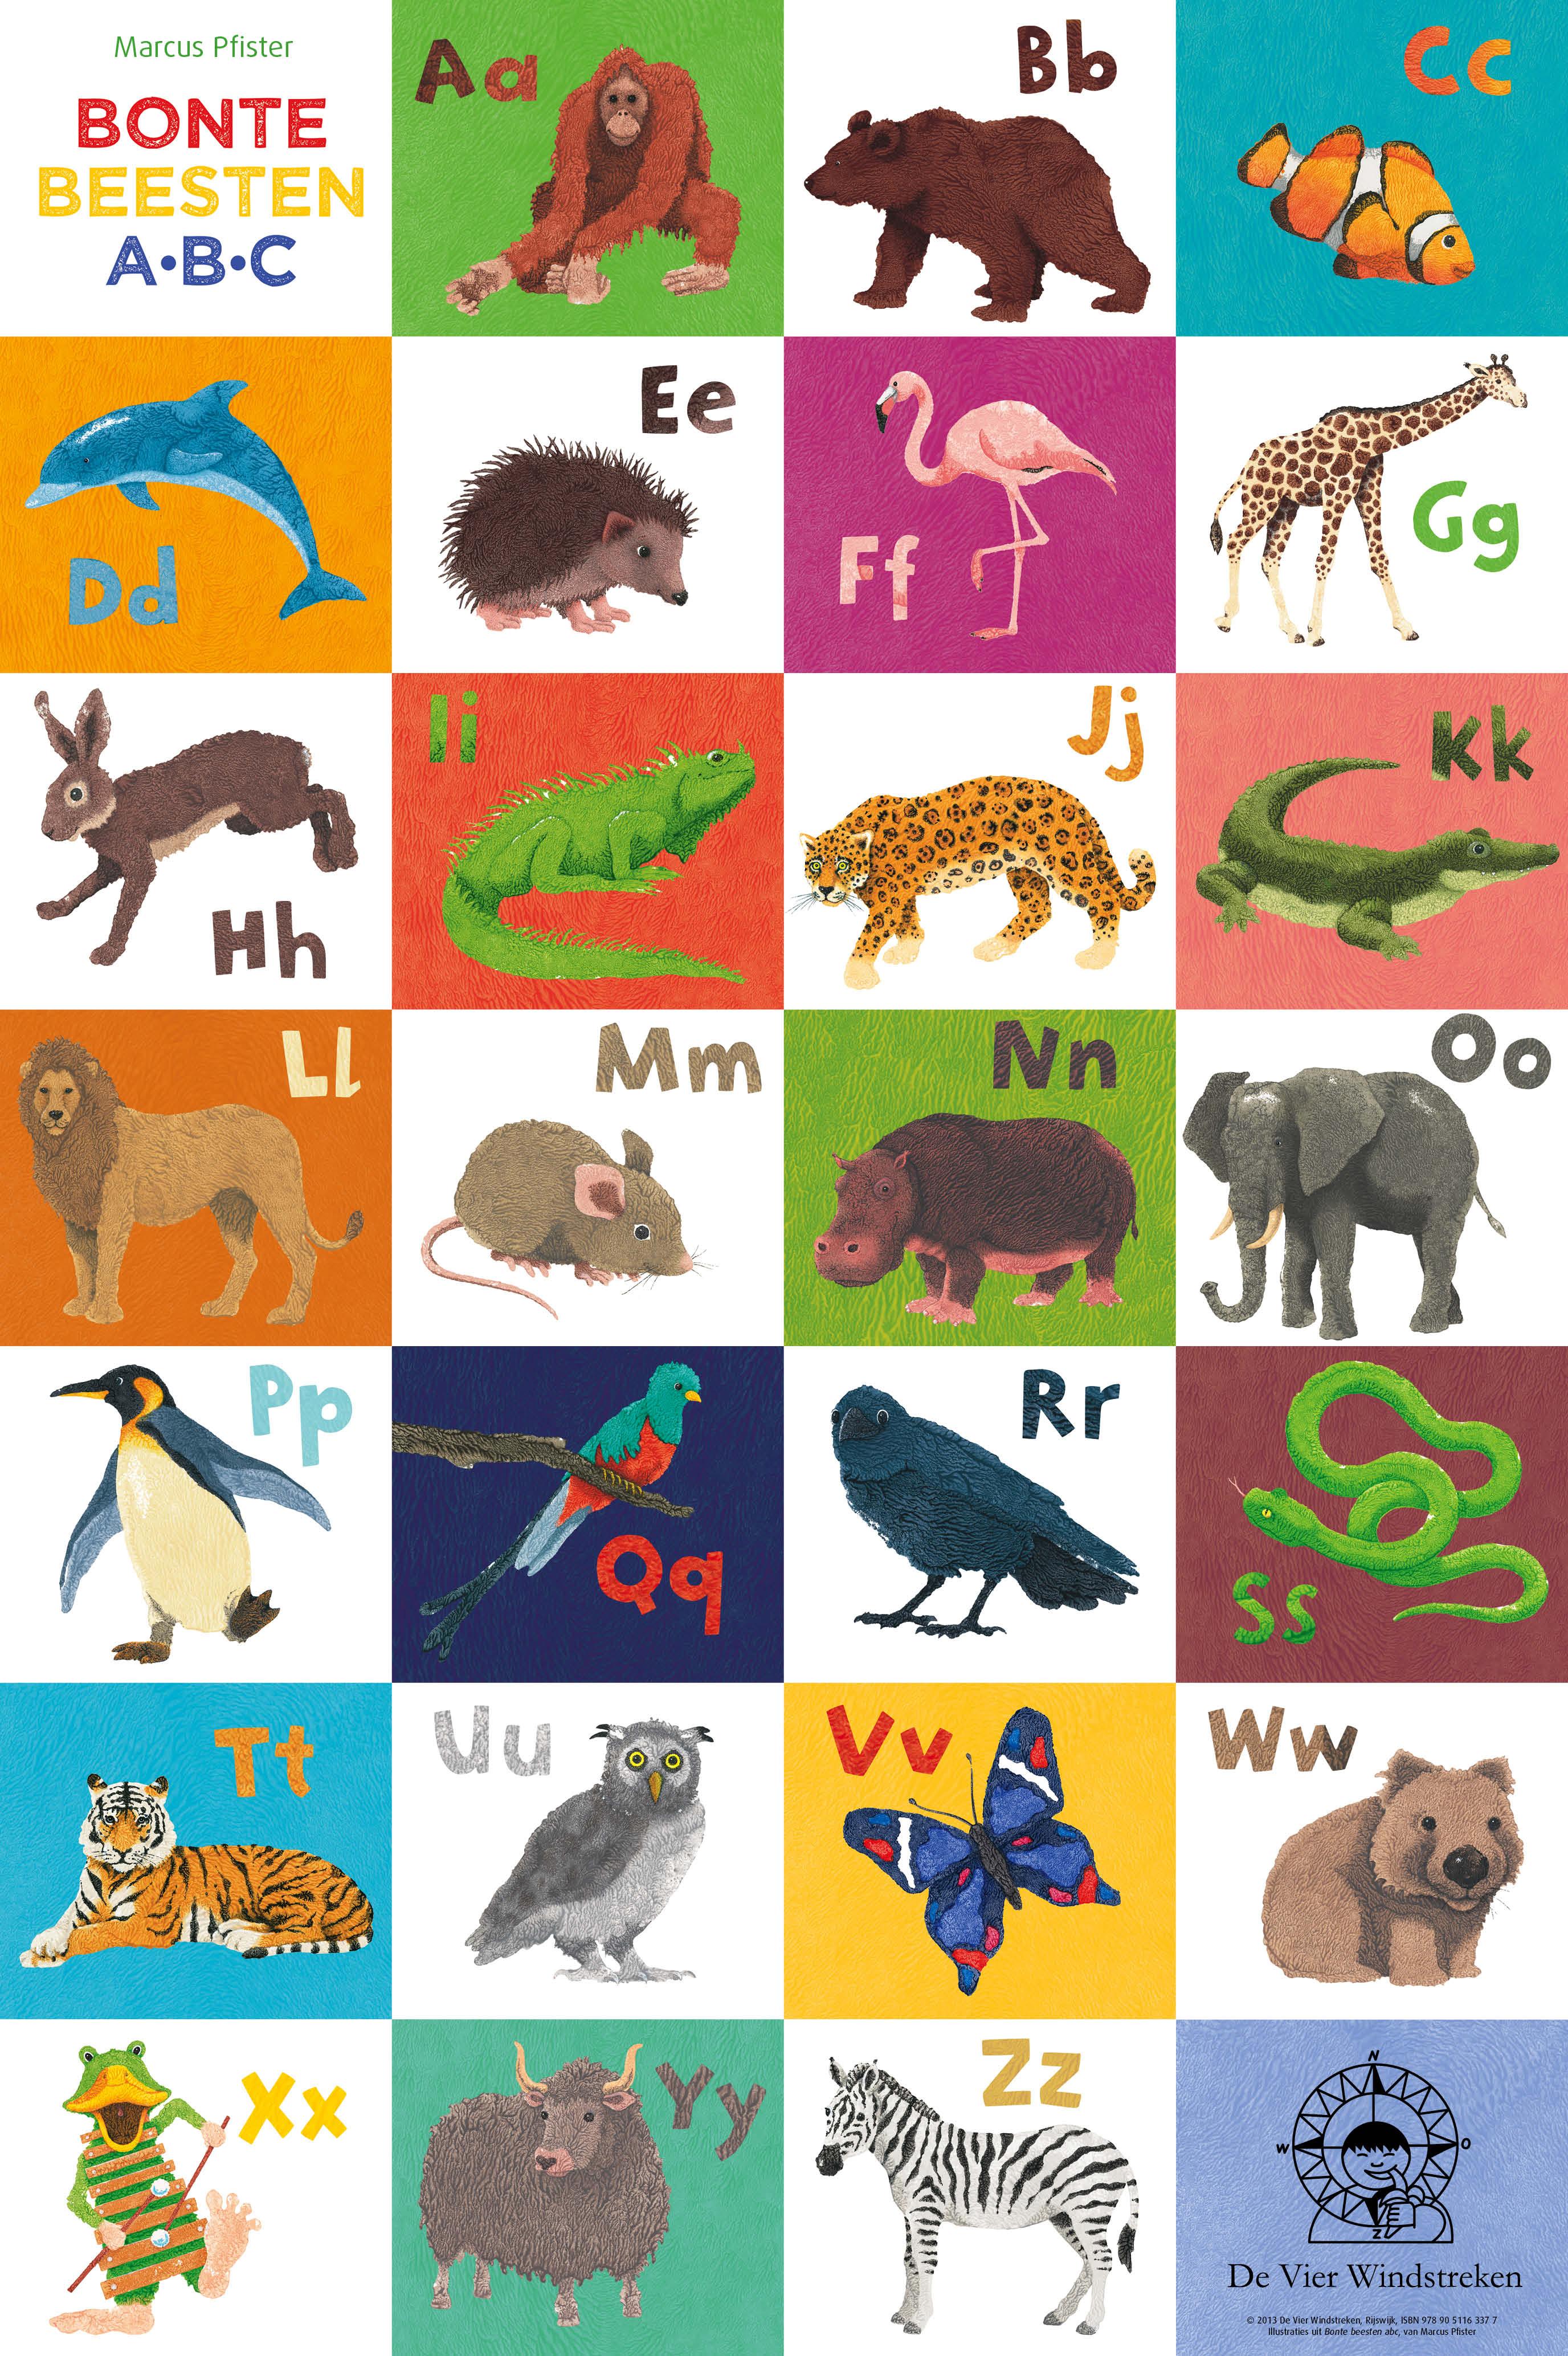 Poster, Bonte beesten abc